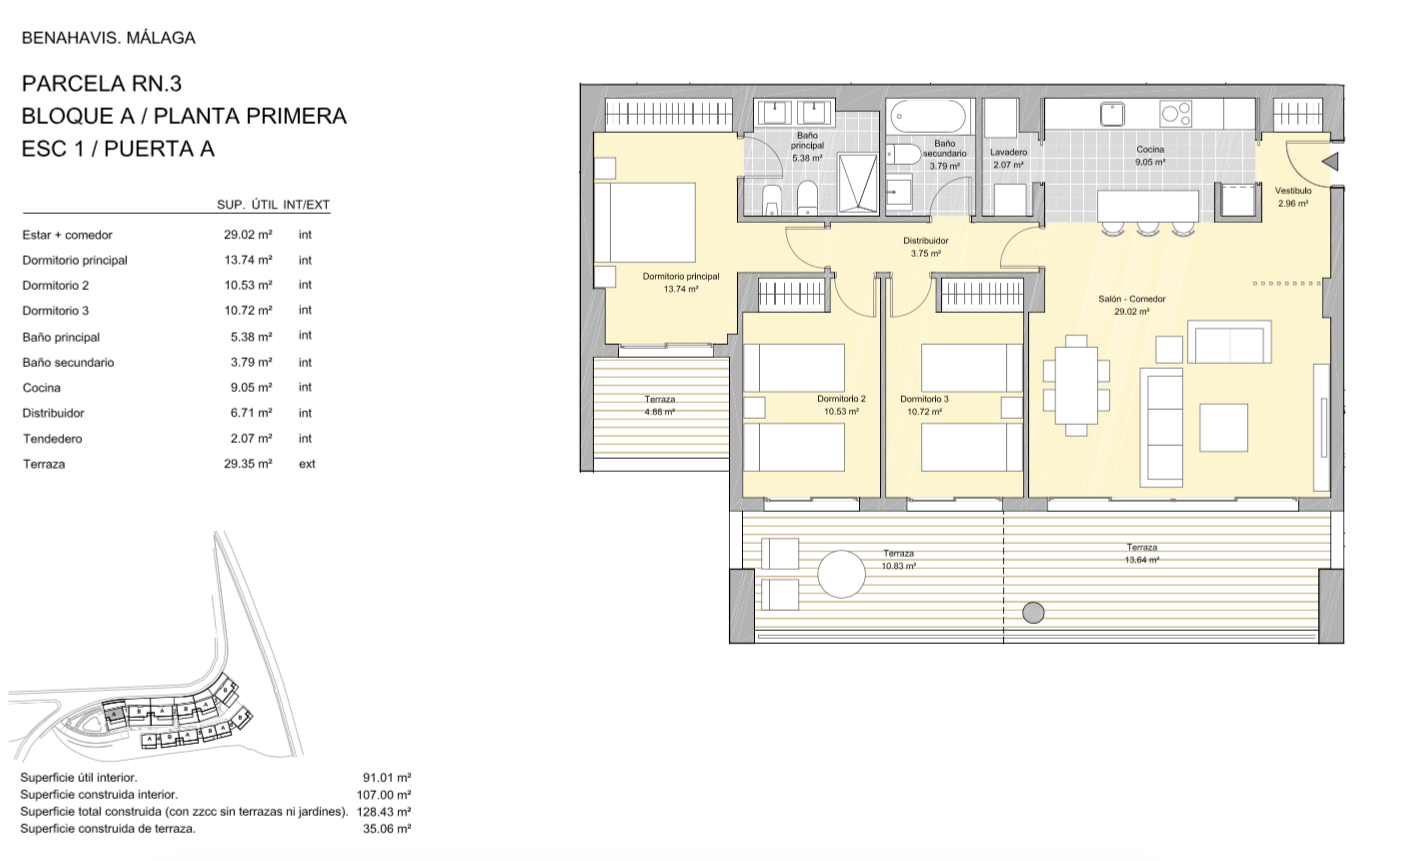 alborada homes benahavis golf la quinta moderne appartementen penthouses te koop grondplan RN3 11A verdieping 3bed